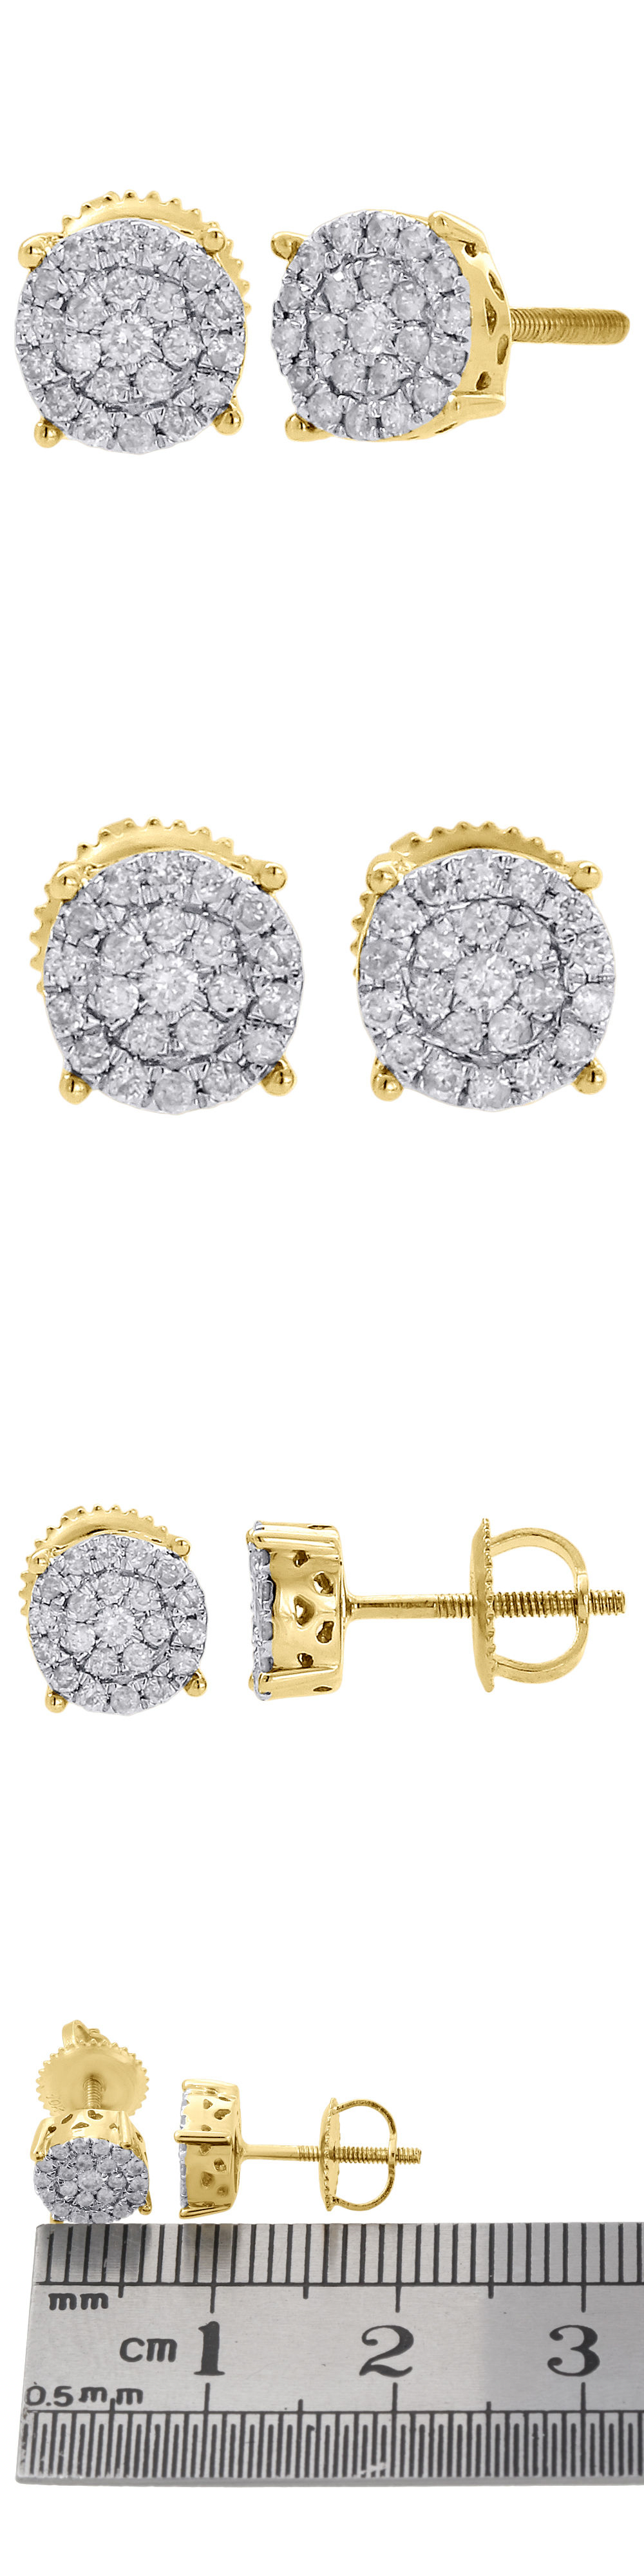 Earrings Studs 2 90Ct 14K White Gold Round Cut Si2 Diamond